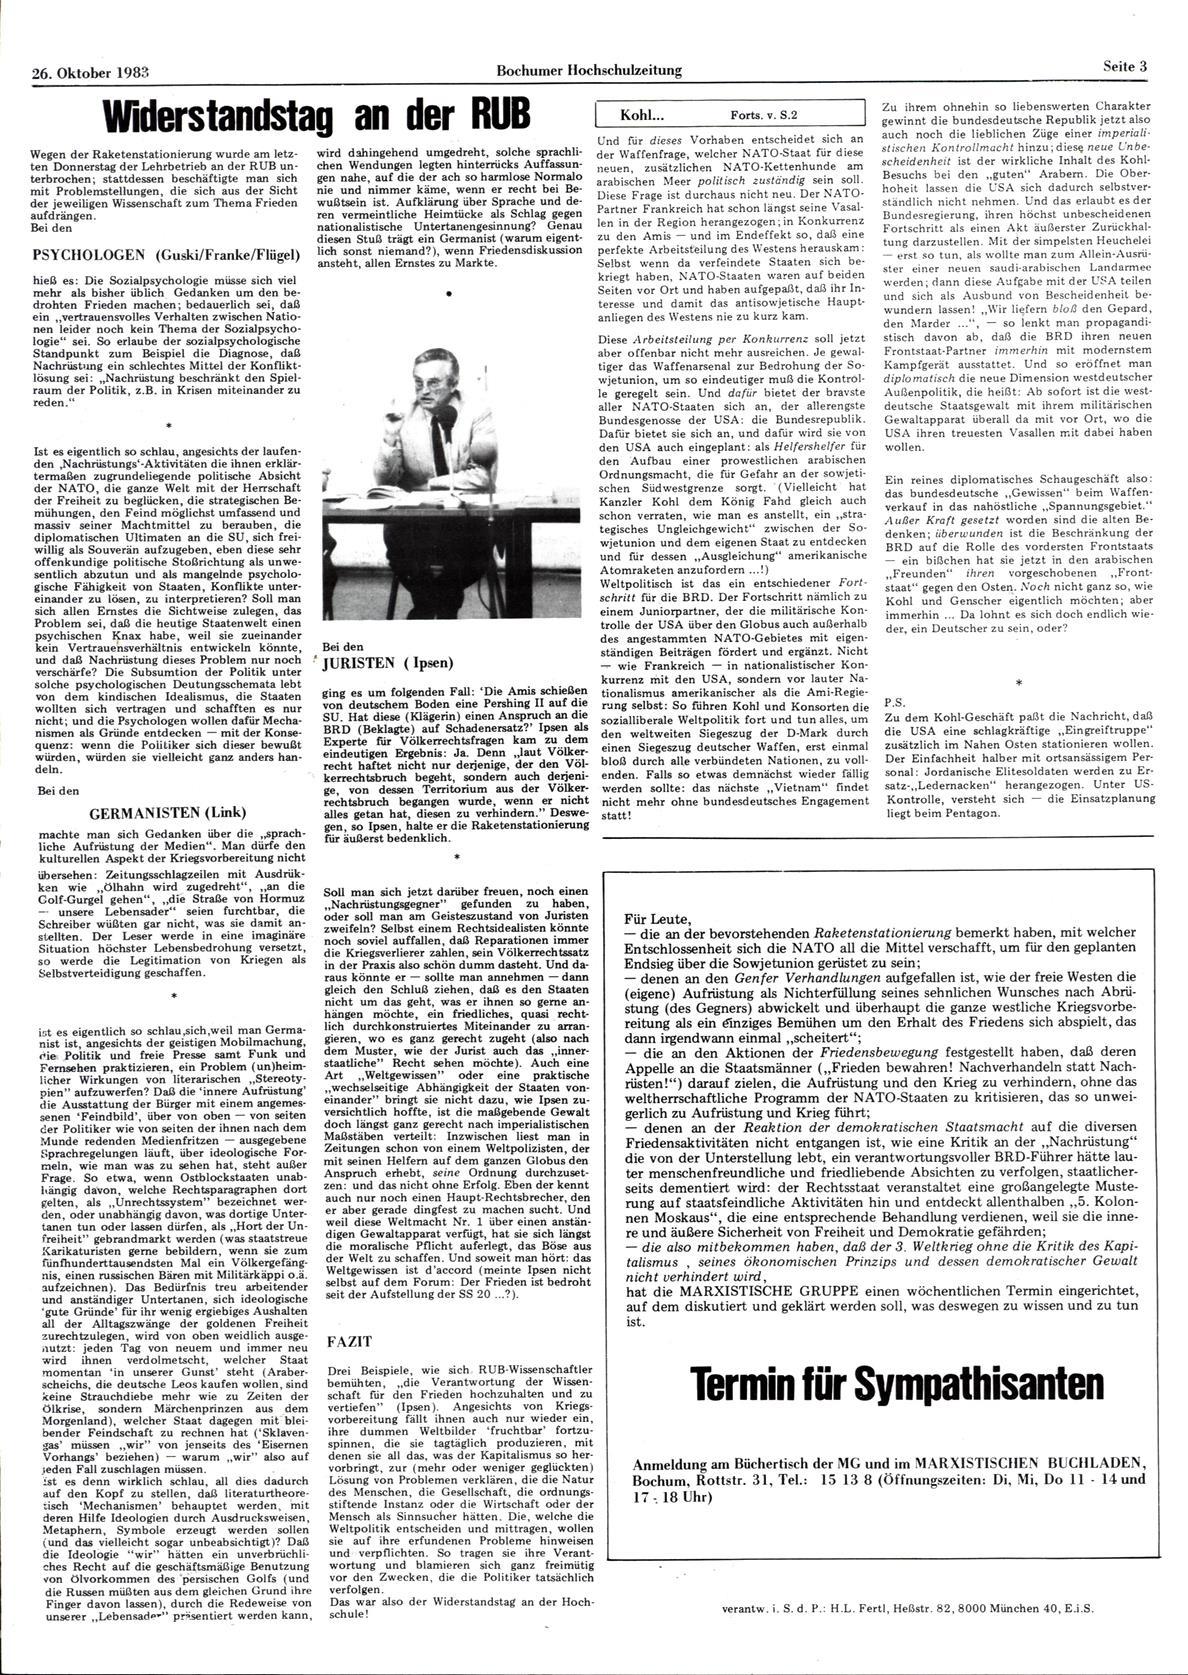 Bochum_BHZ_19831026_078_003